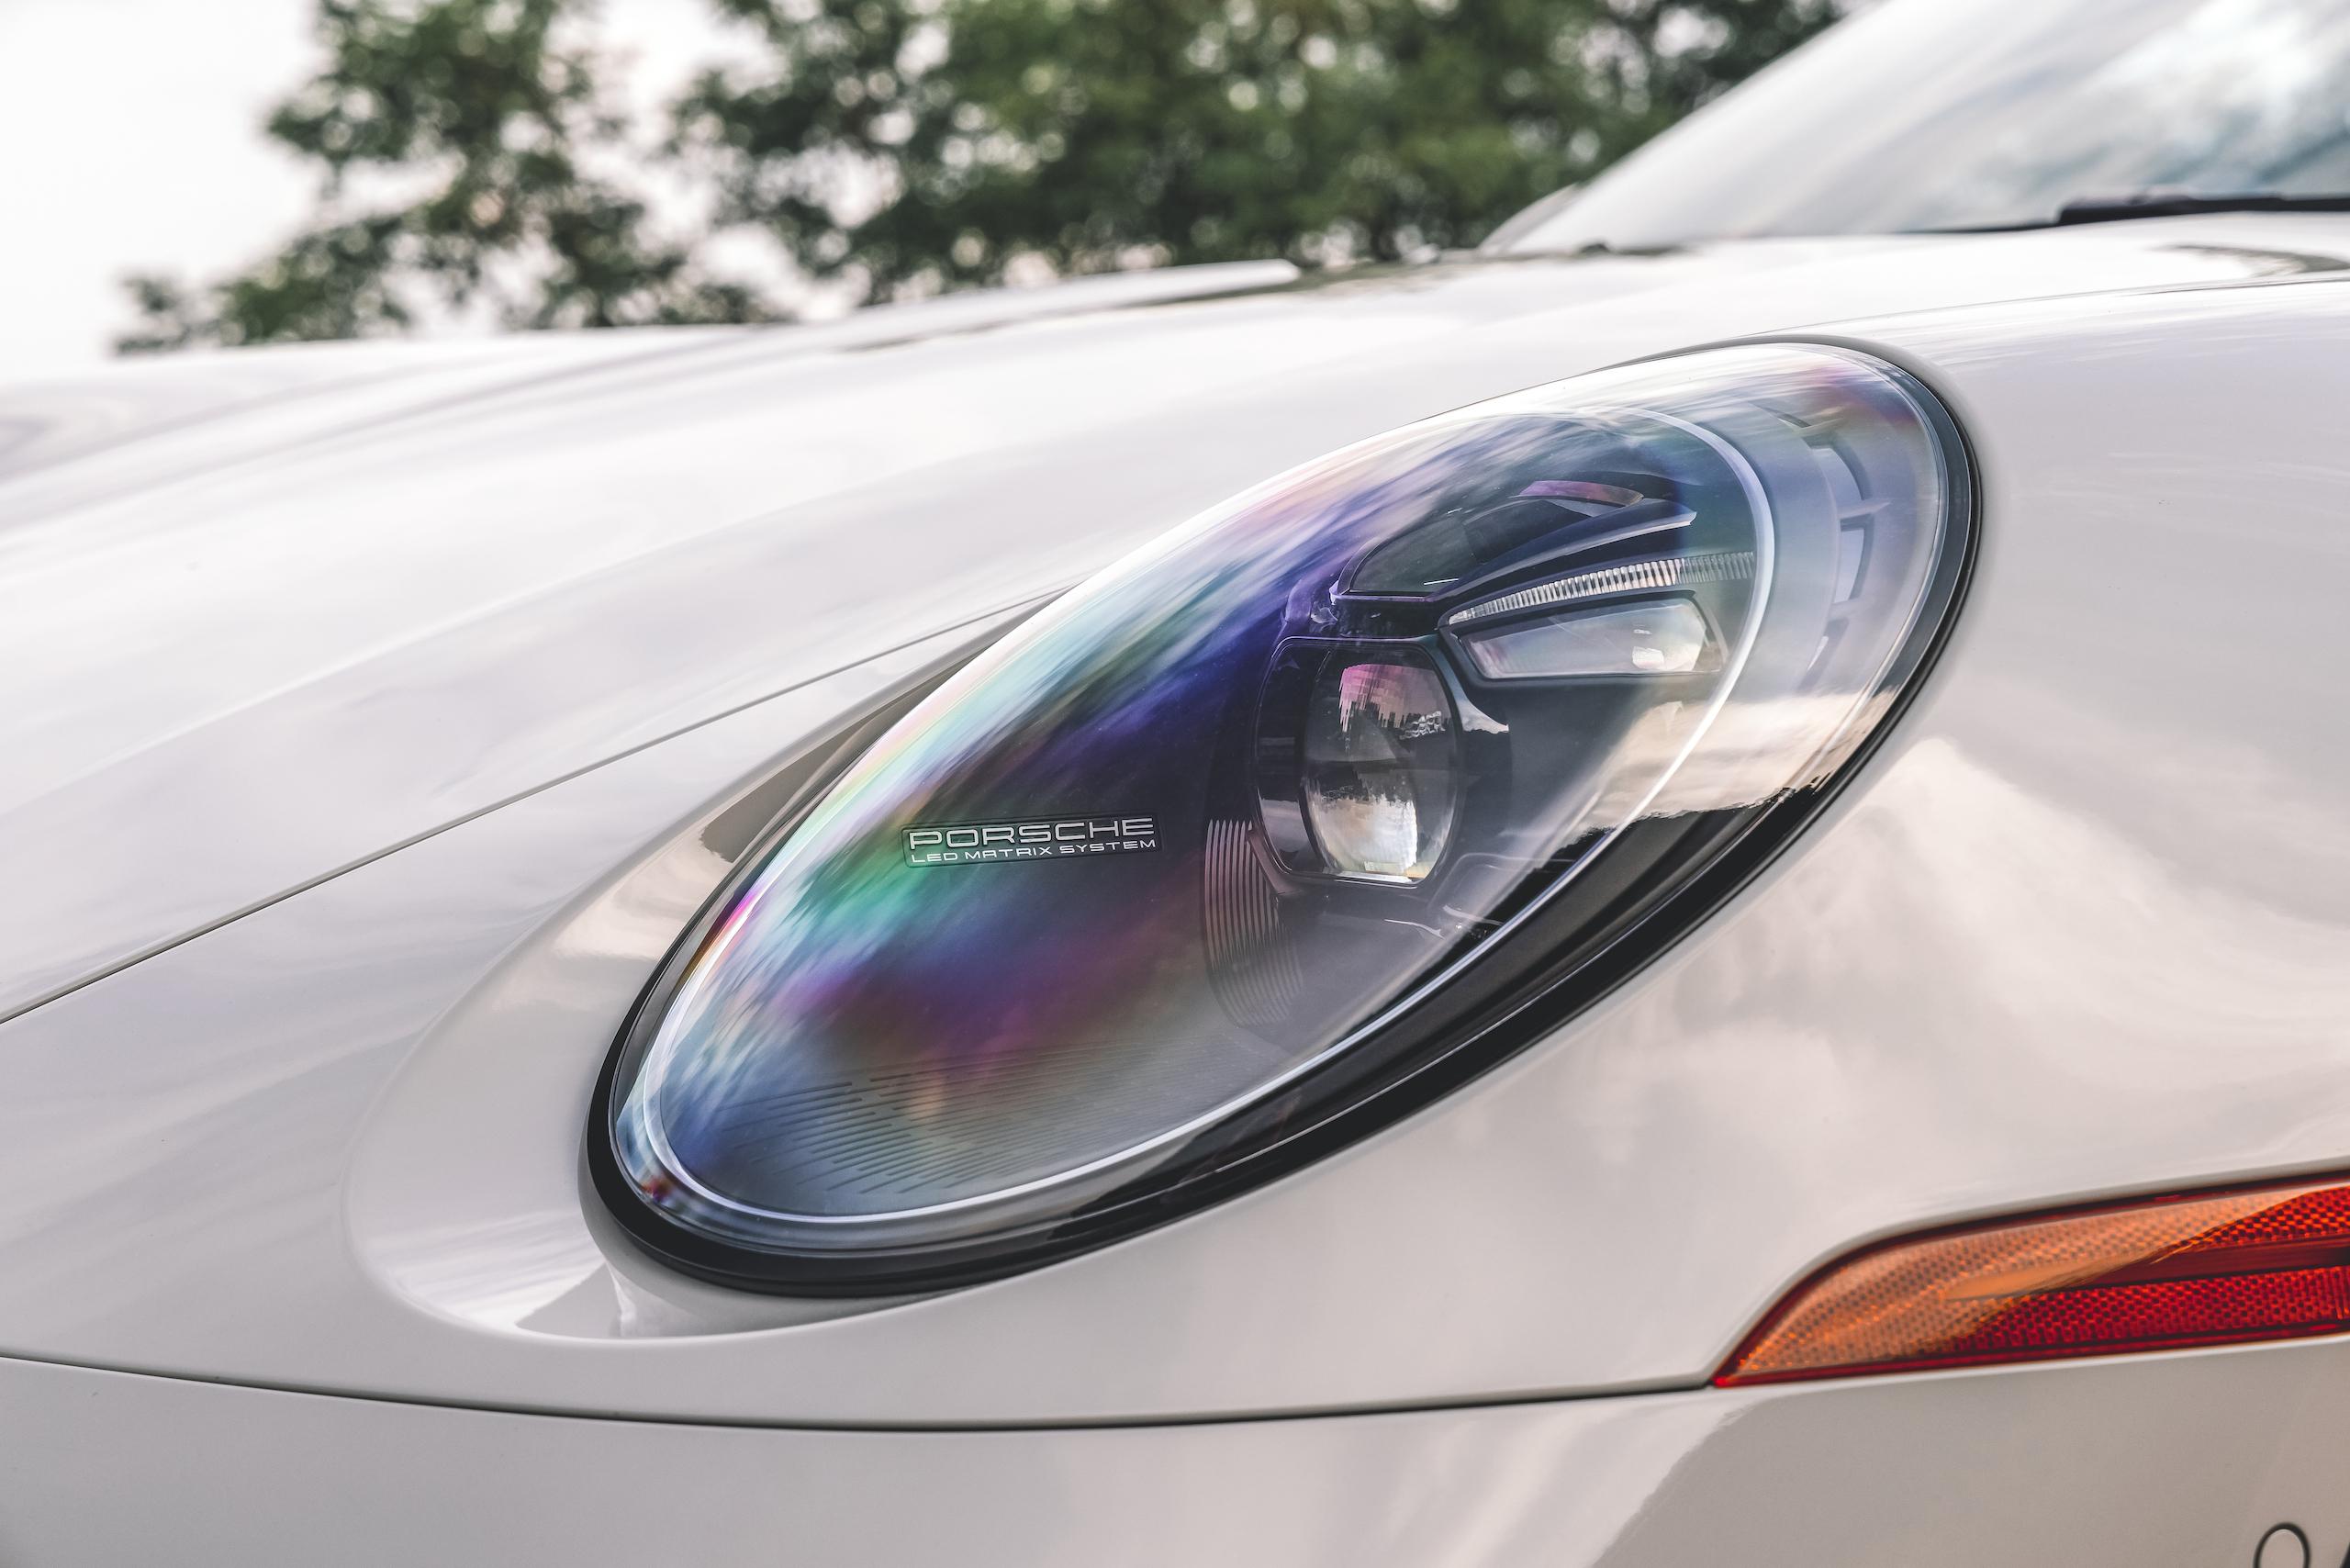 Porsche 911 Targa 4 GTS headlight led matrix system